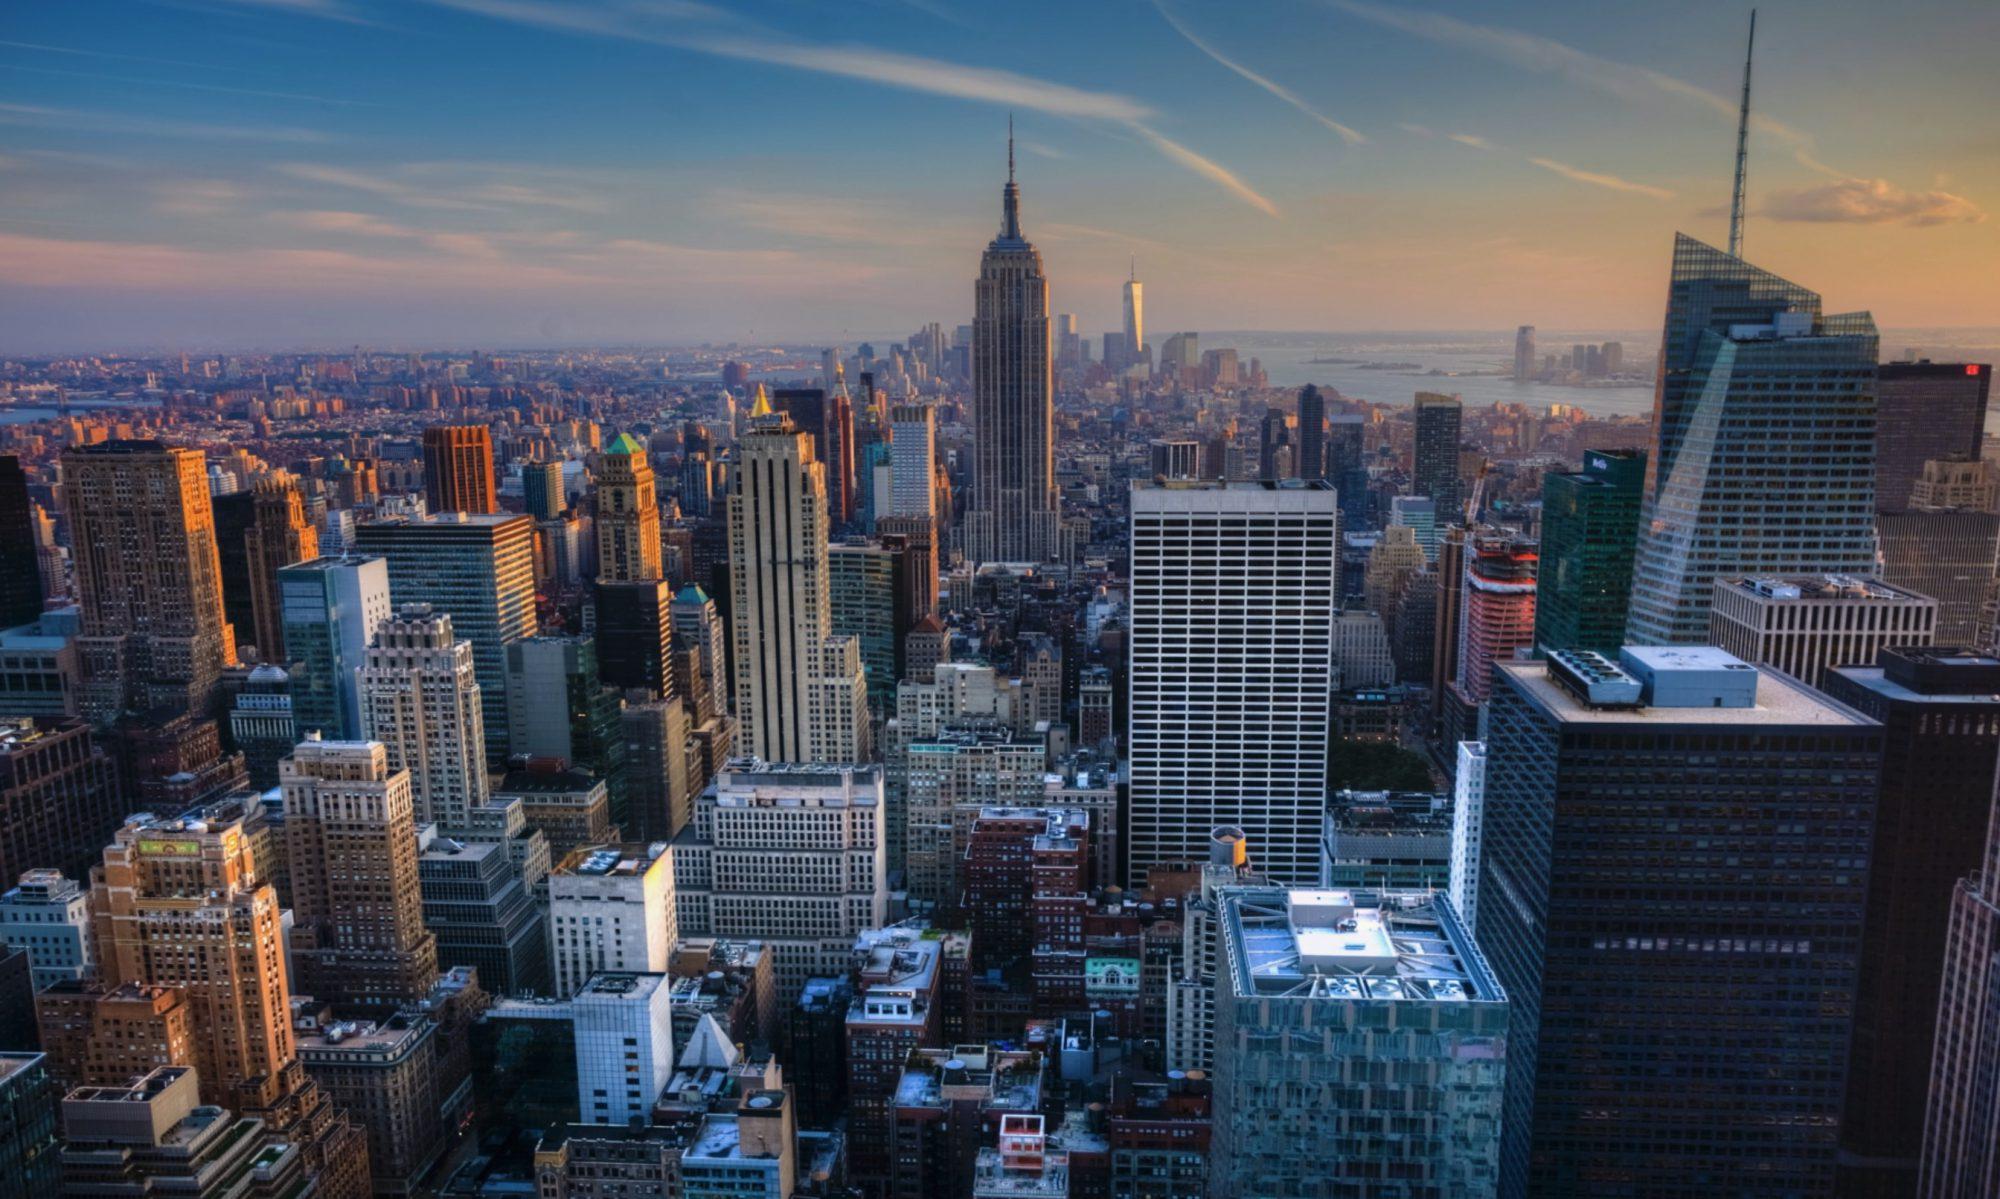 WordCamp New York City – October 21-22, 2017